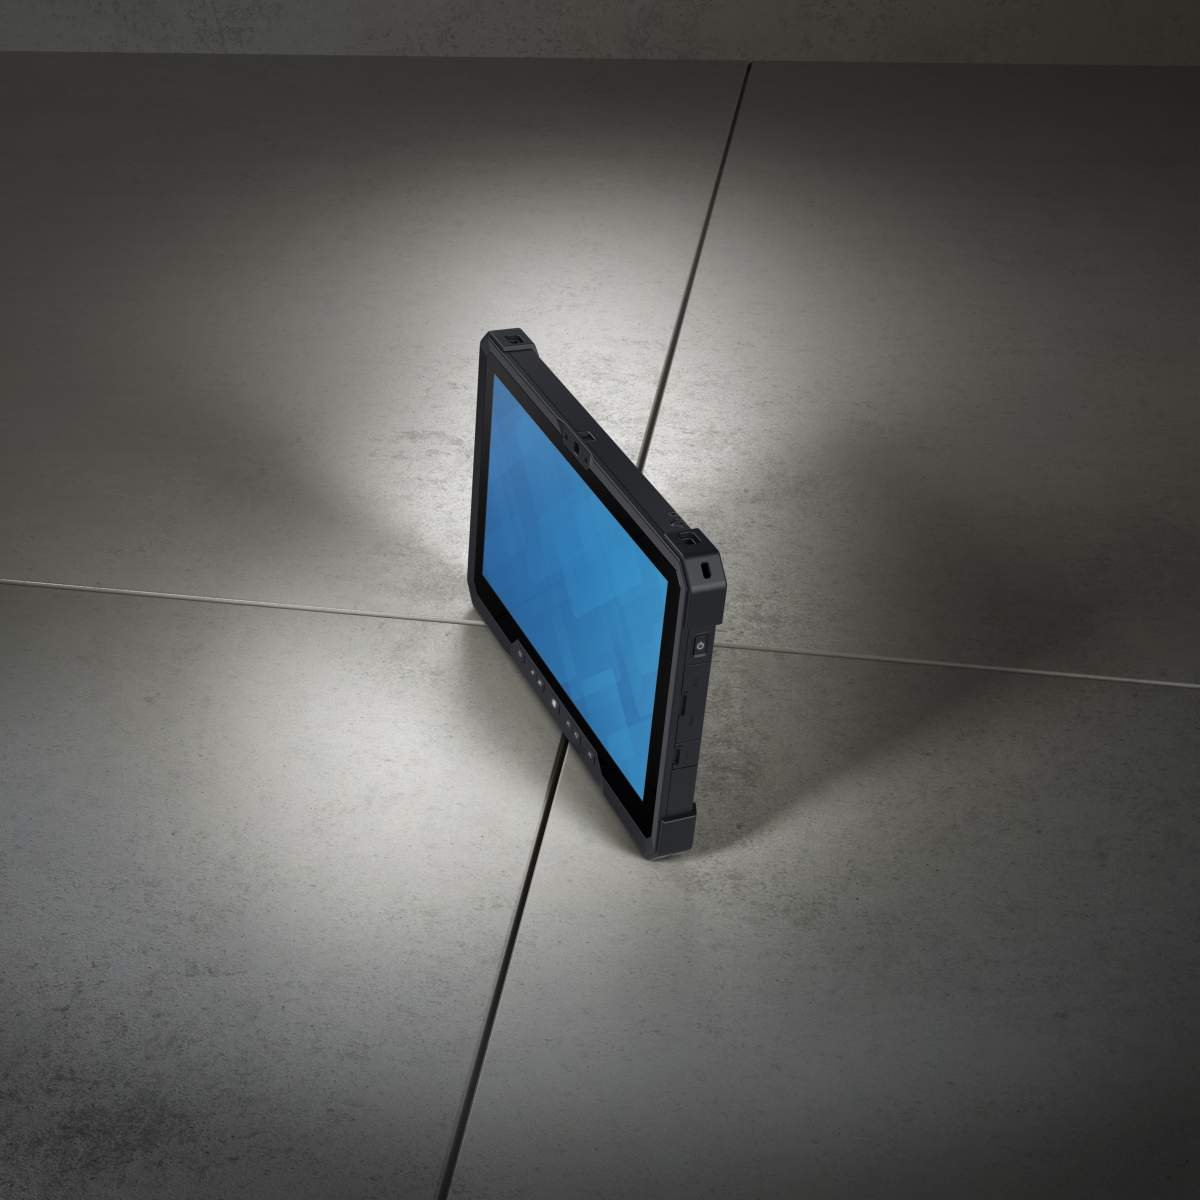 ноутбук как планшет